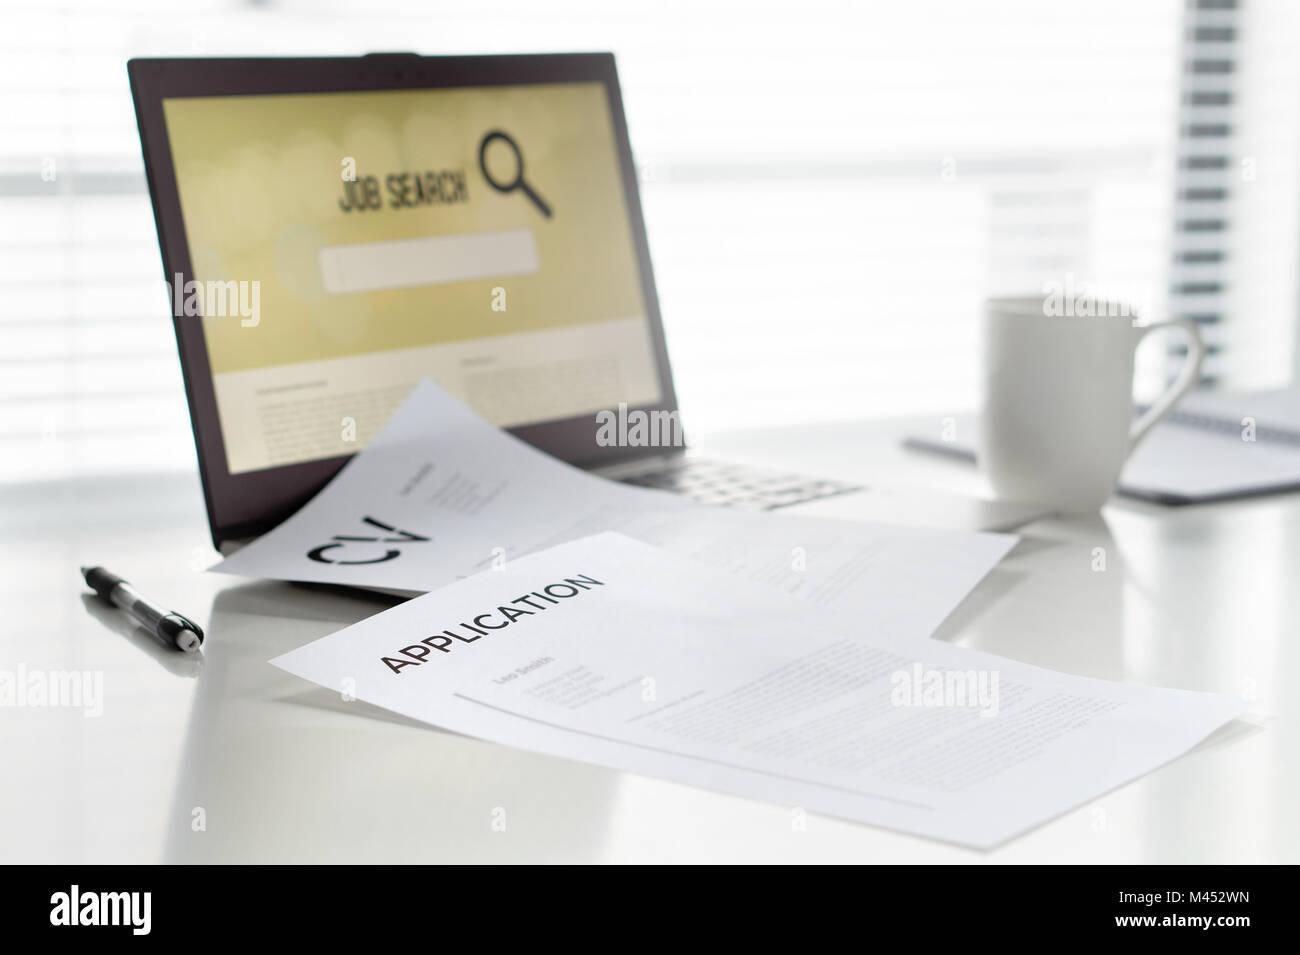 Job Seeking Imágenes De Stock & Job Seeking Fotos De Stock - Alamy